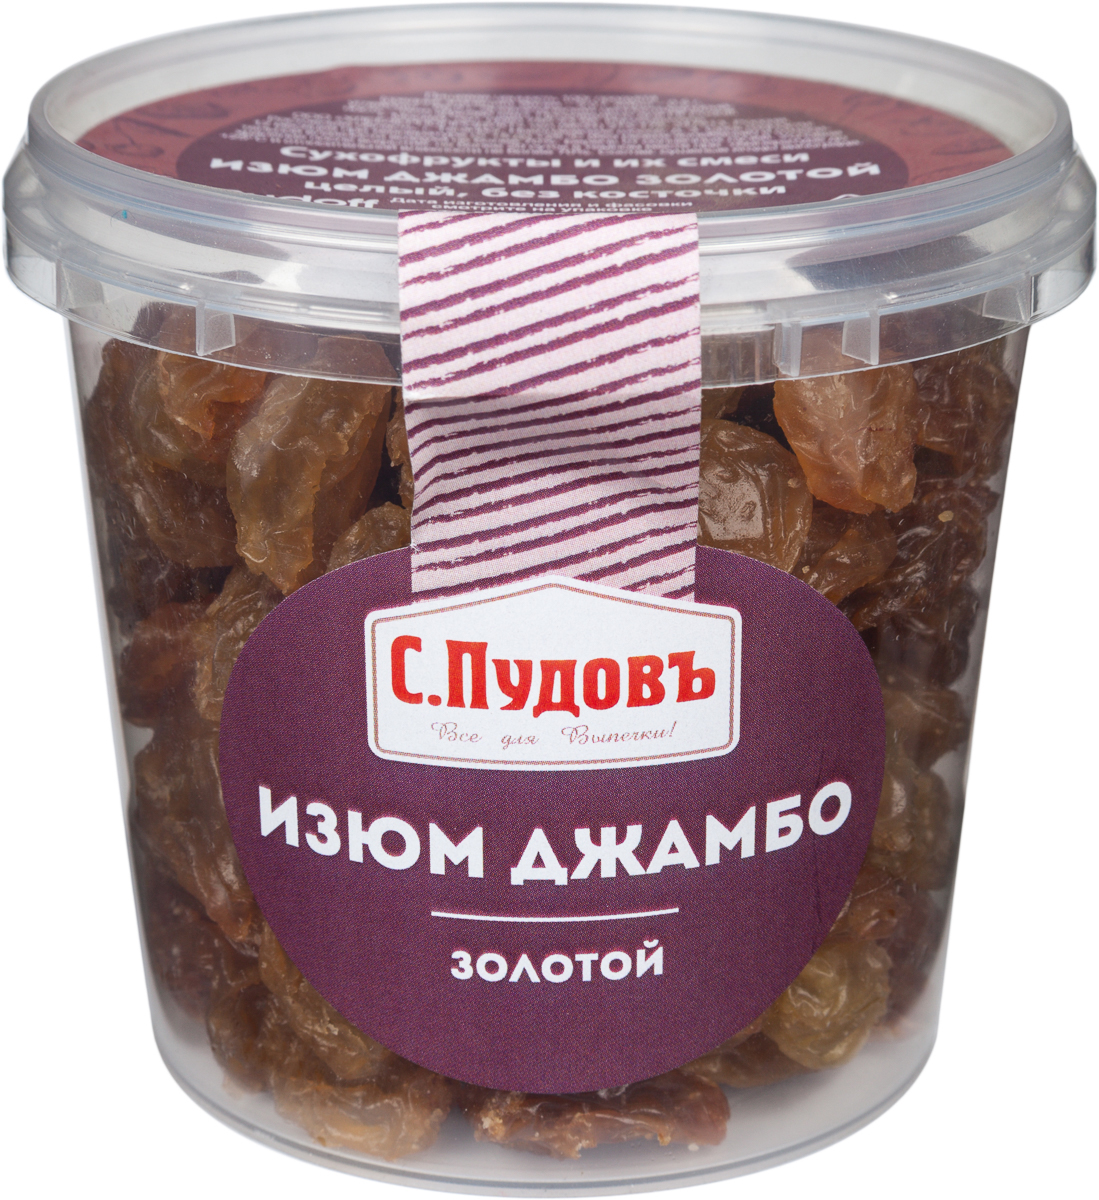 Пудовъ изюм Джамбо золотой, 190 г пудовъ льняной хлеб 500 г